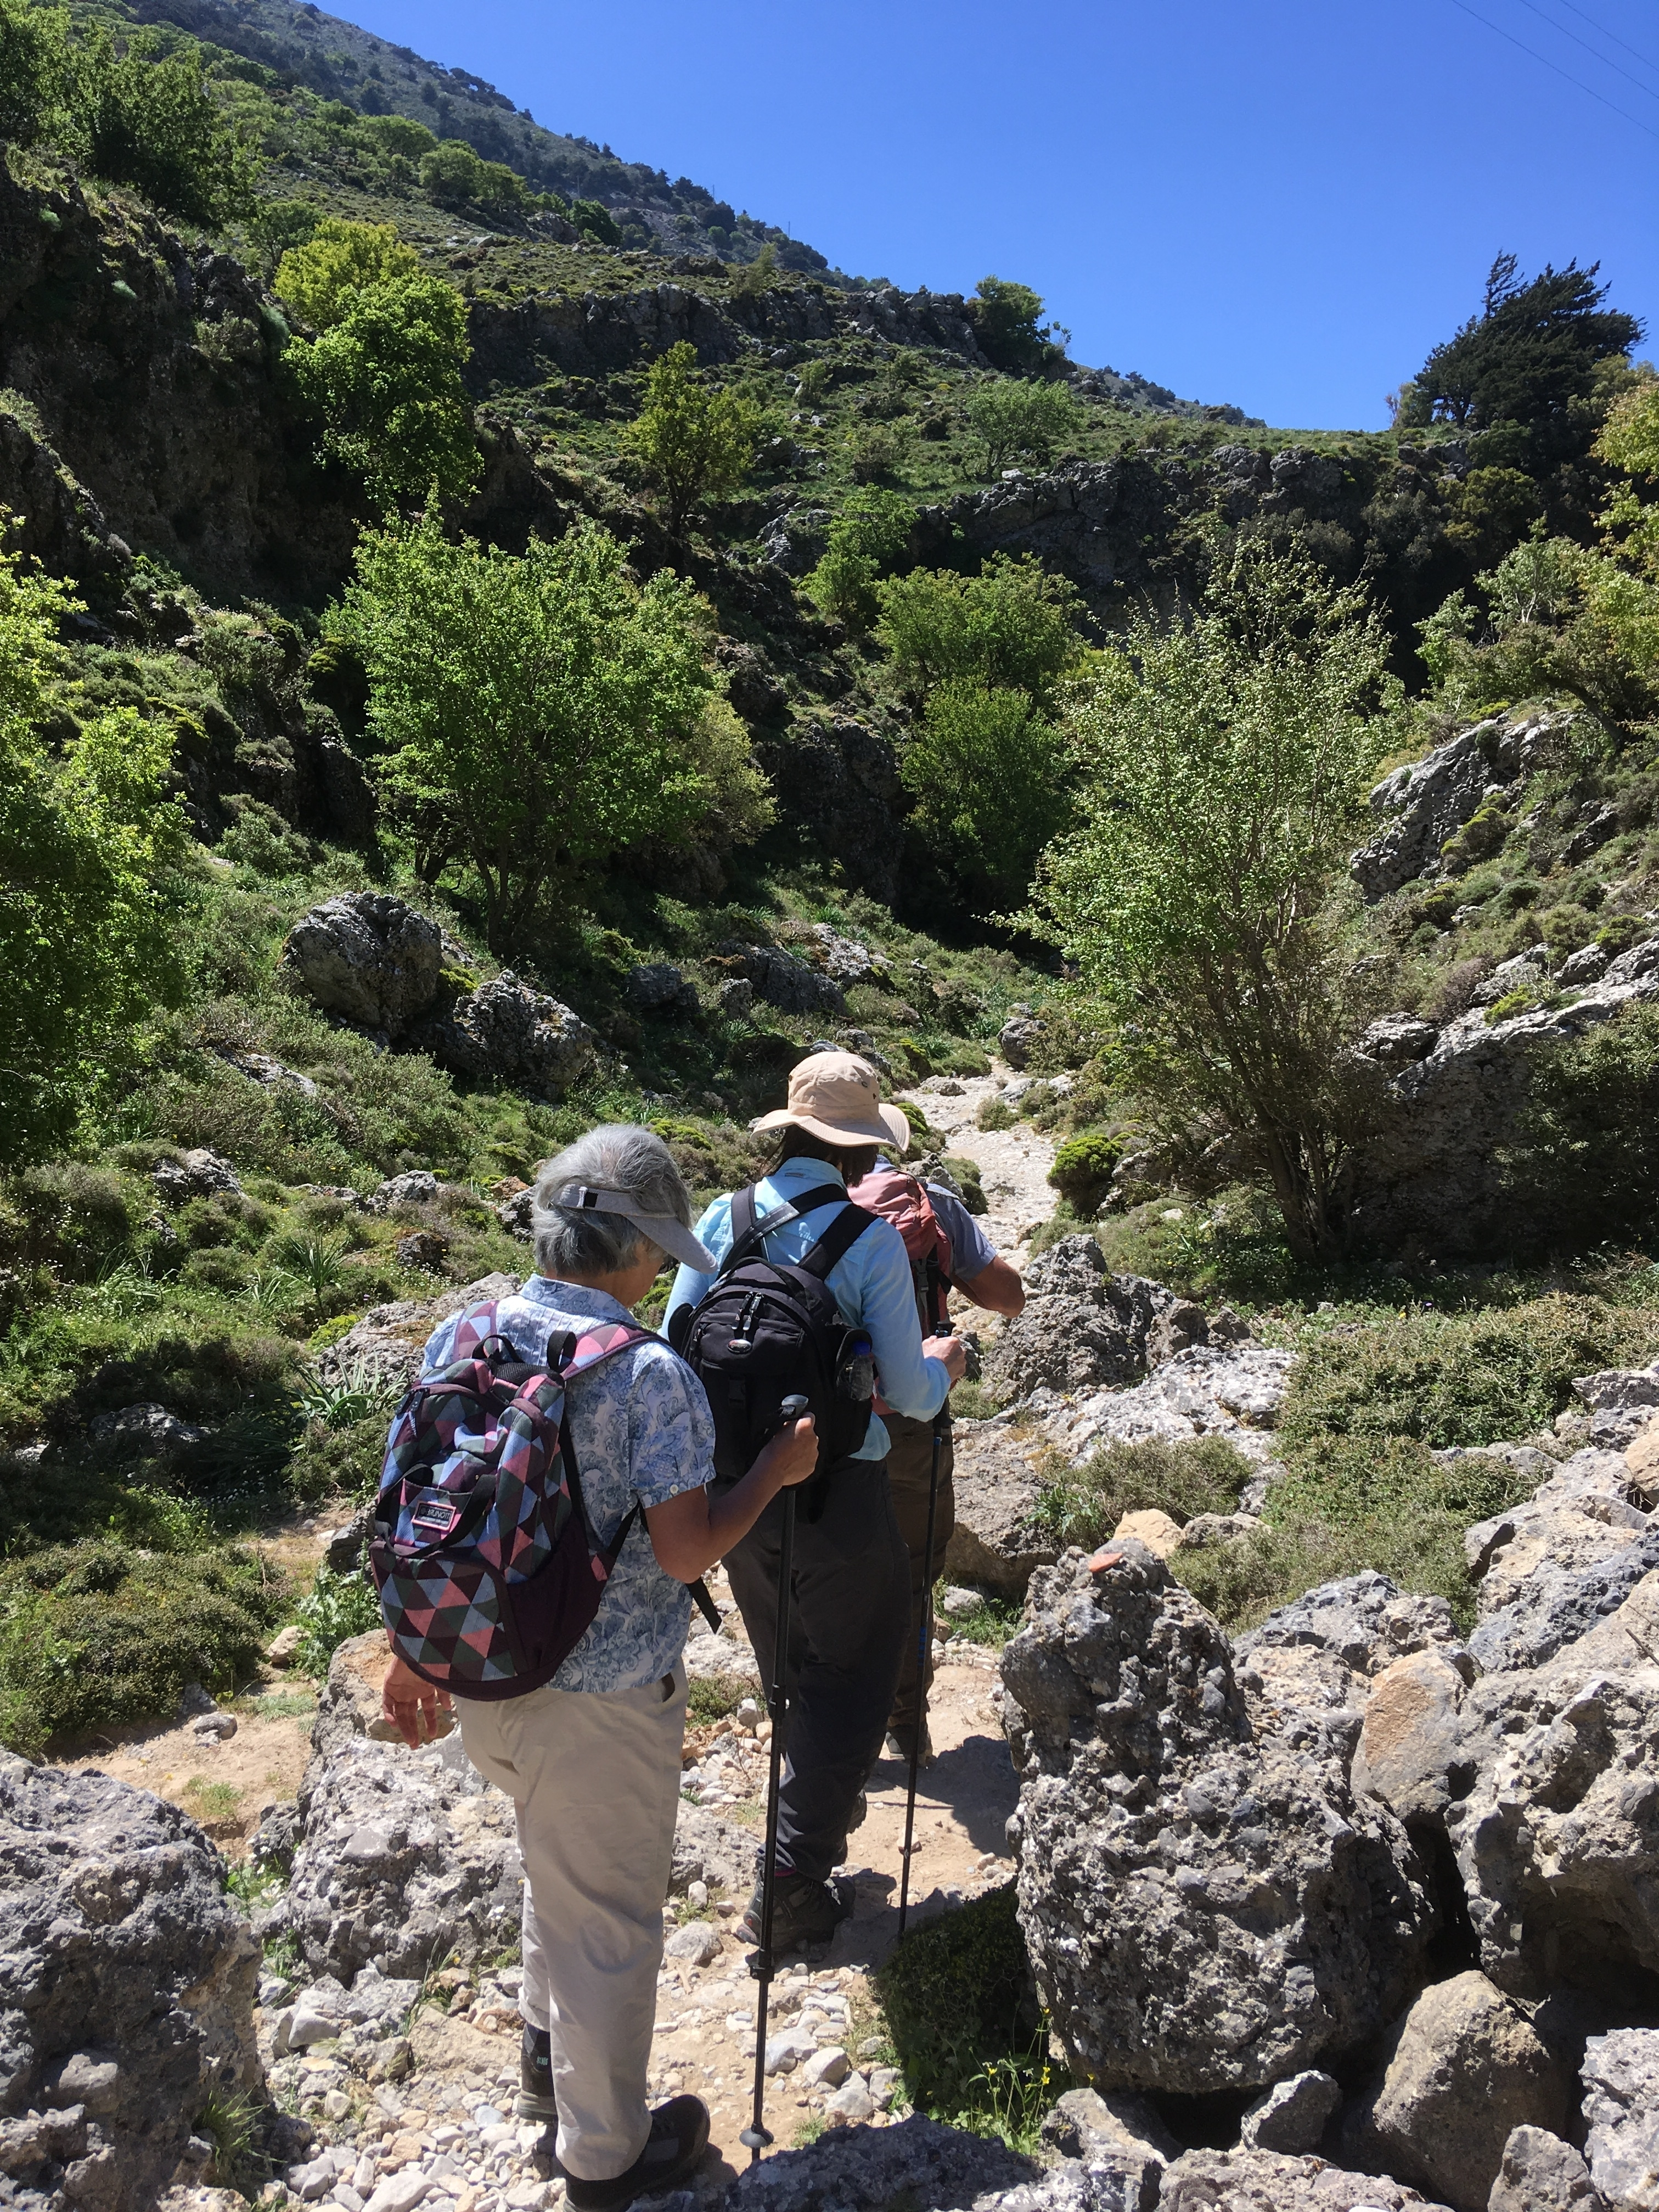 Hiking on Crete